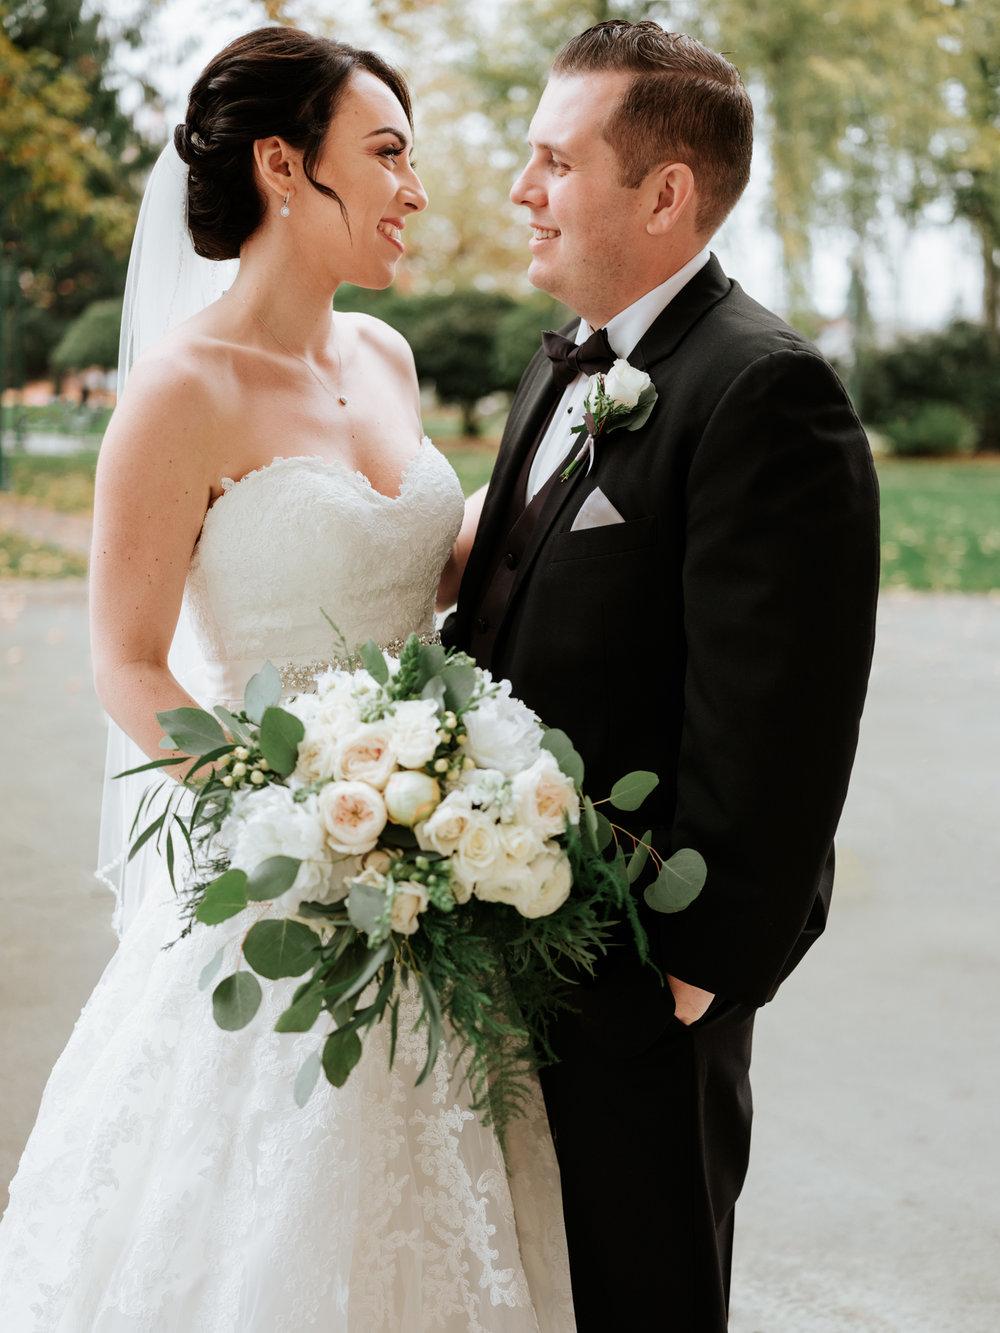 Stolen Glimpses Seattle Wedding Photographers 27.jpg